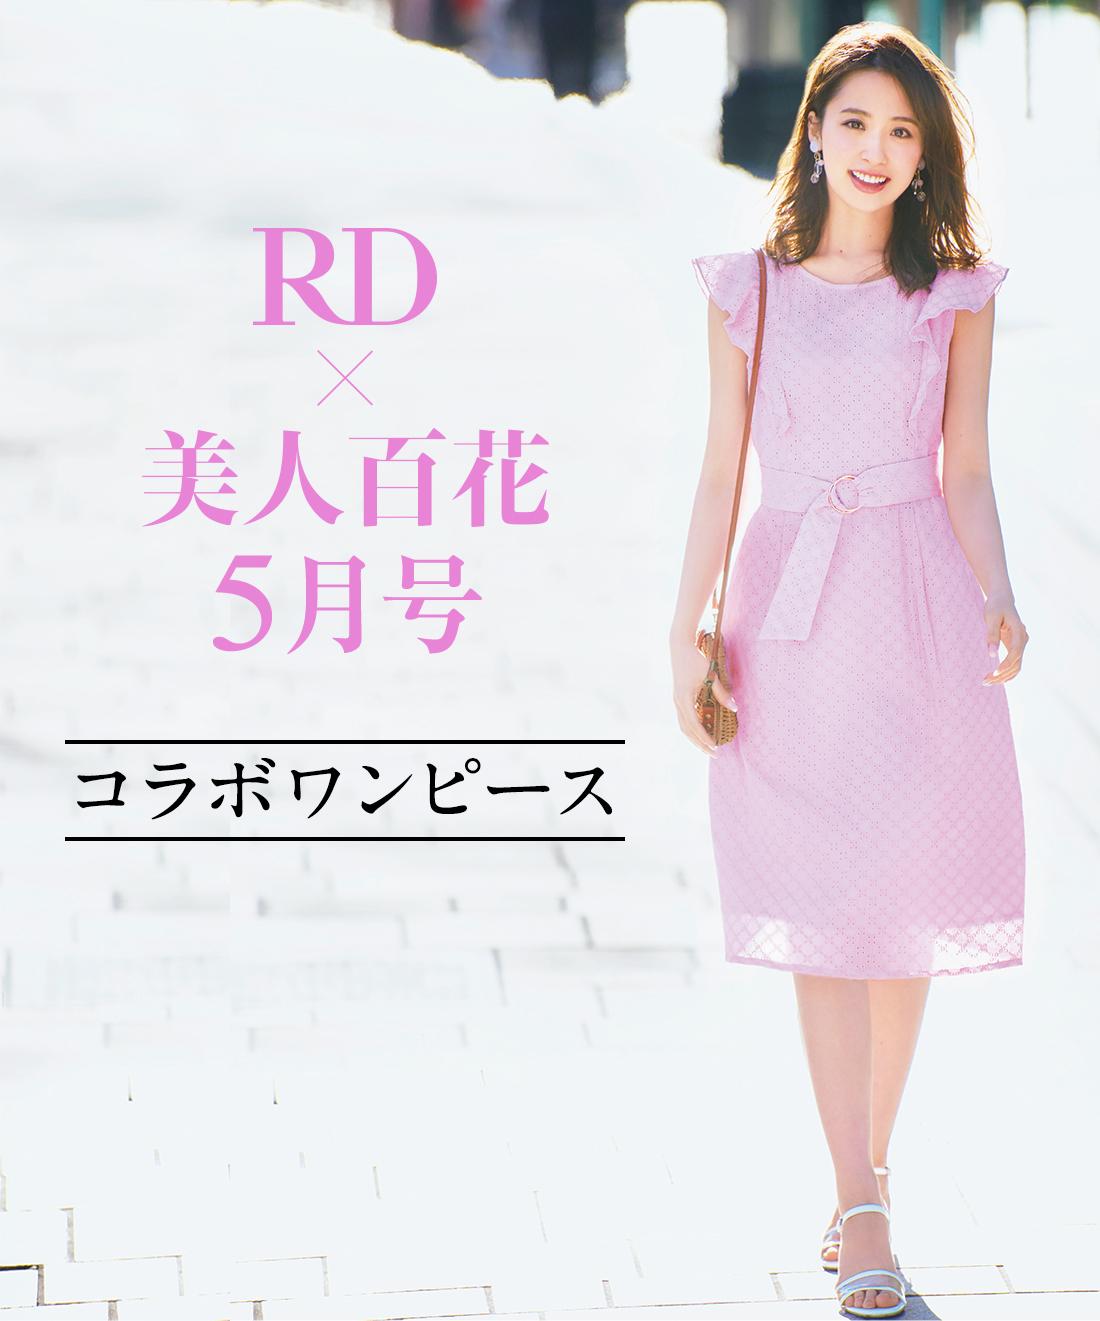 RD×美人百花5月号コラボ